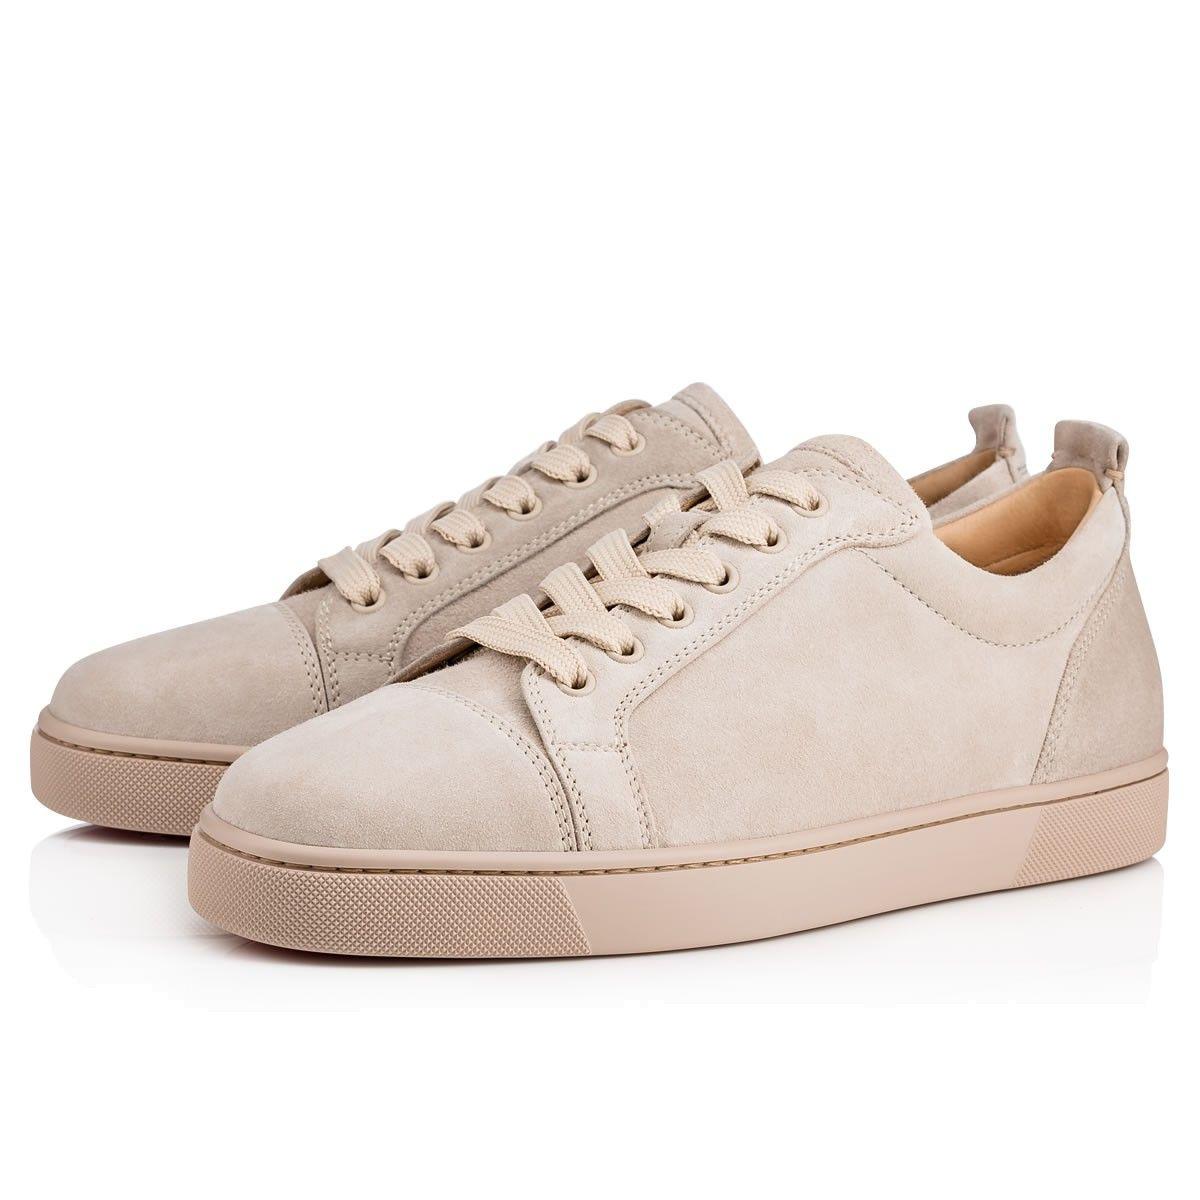 cb84c7431a09 CHRISTIAN LOUBOUTIN Louis Junior Men S Flat Colombe Suede - Men Shoes - Christian  Louboutin.  christianlouboutin  shoes